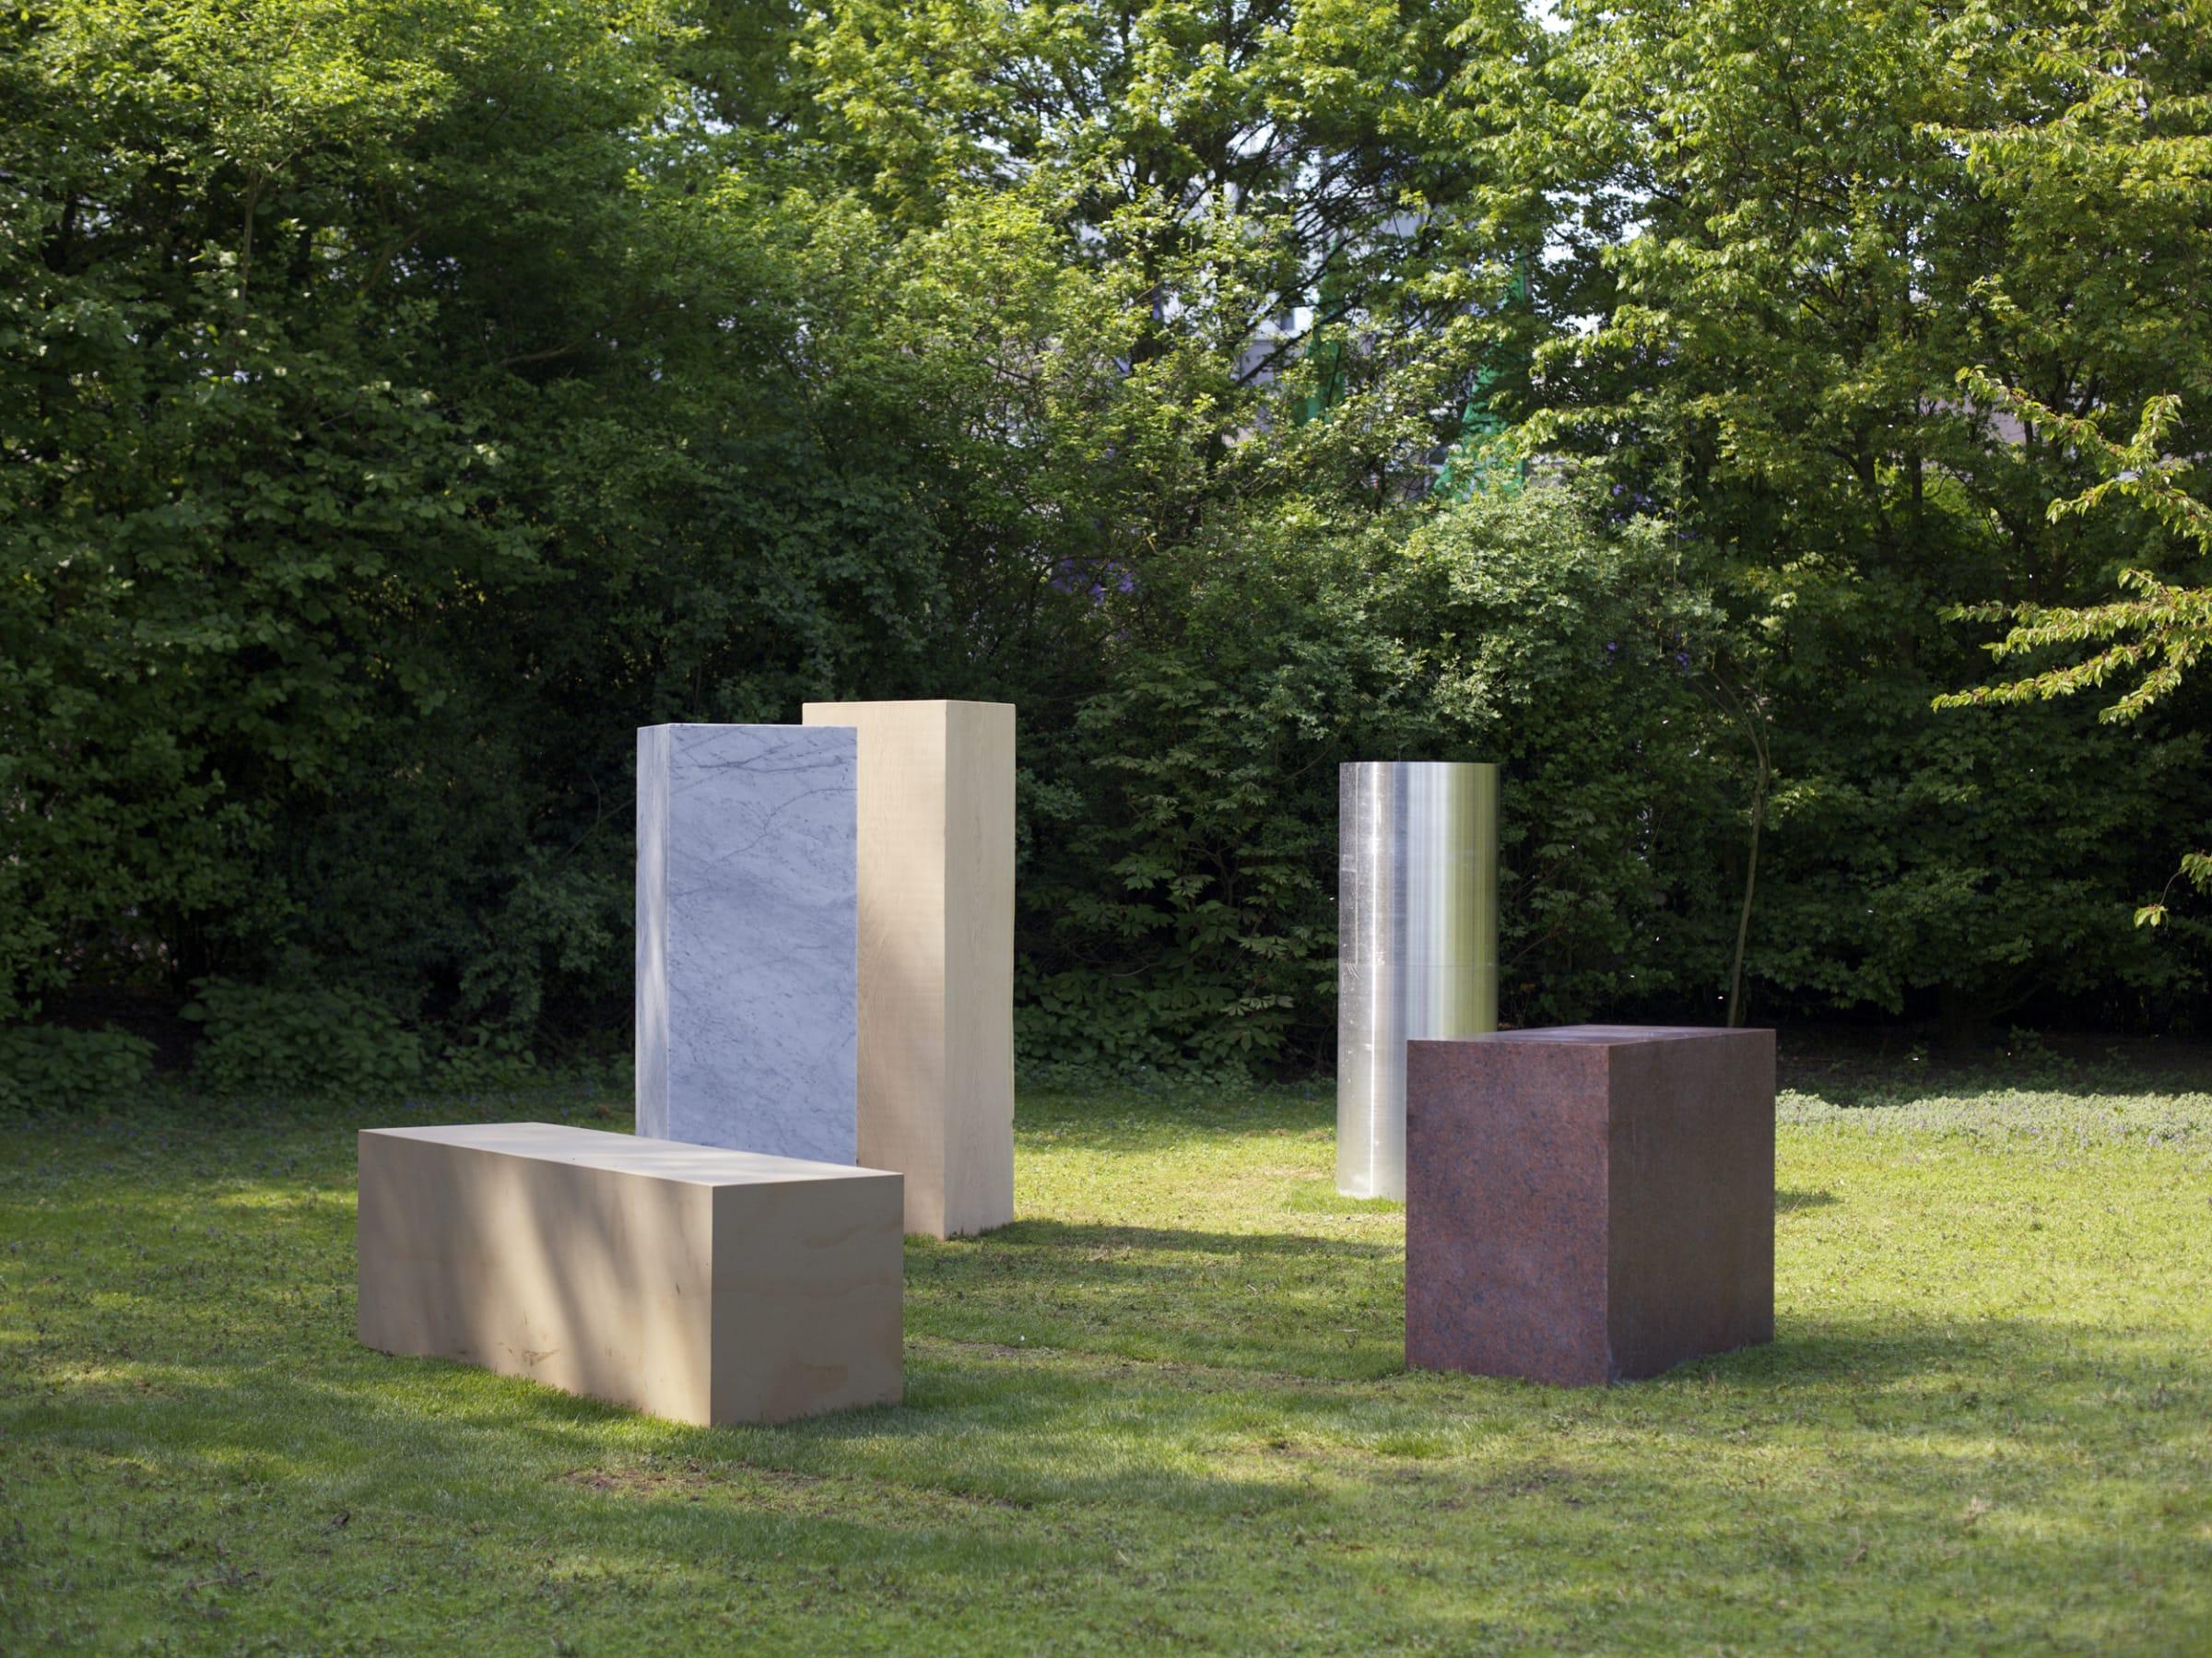 "<span class=""link fancybox-details-link""><a href=""/artists/36-alicja-kwade/works/15126/"">View Detail Page</a></span><div class=""artist""><strong>ALICJA KWADE</strong></div> <div class=""title""><em>Anschauungsvorstellung</em>, 2013</div> <div class=""medium"">Carrara marble, rose granite, oak, aluminium, sandstone dimensions variable</div>"